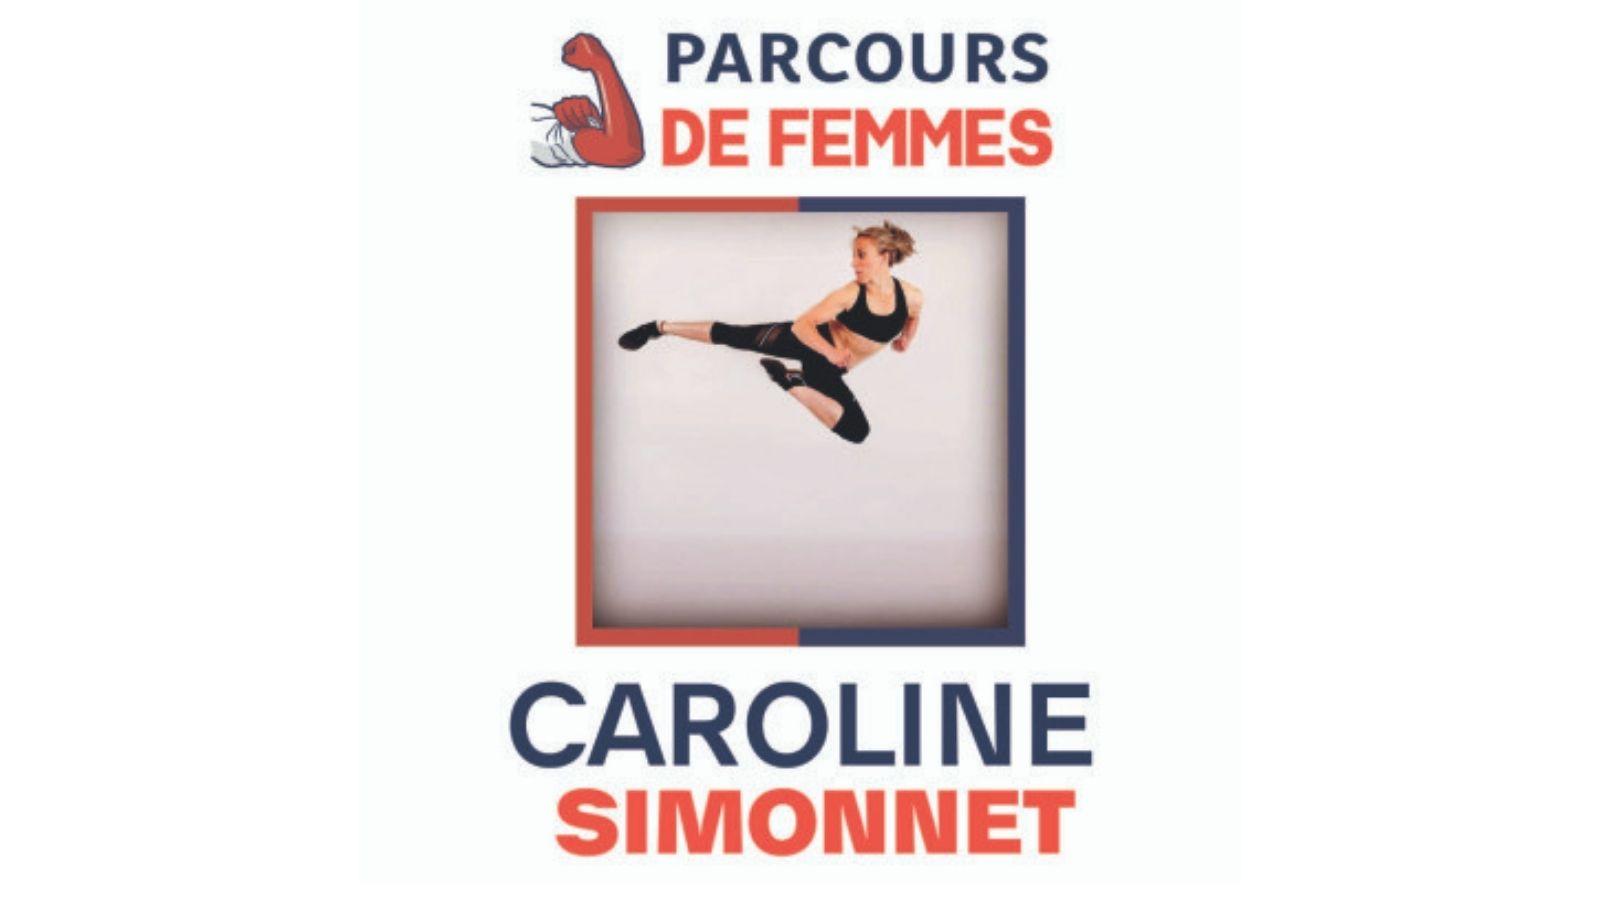 Caroline Simonnet